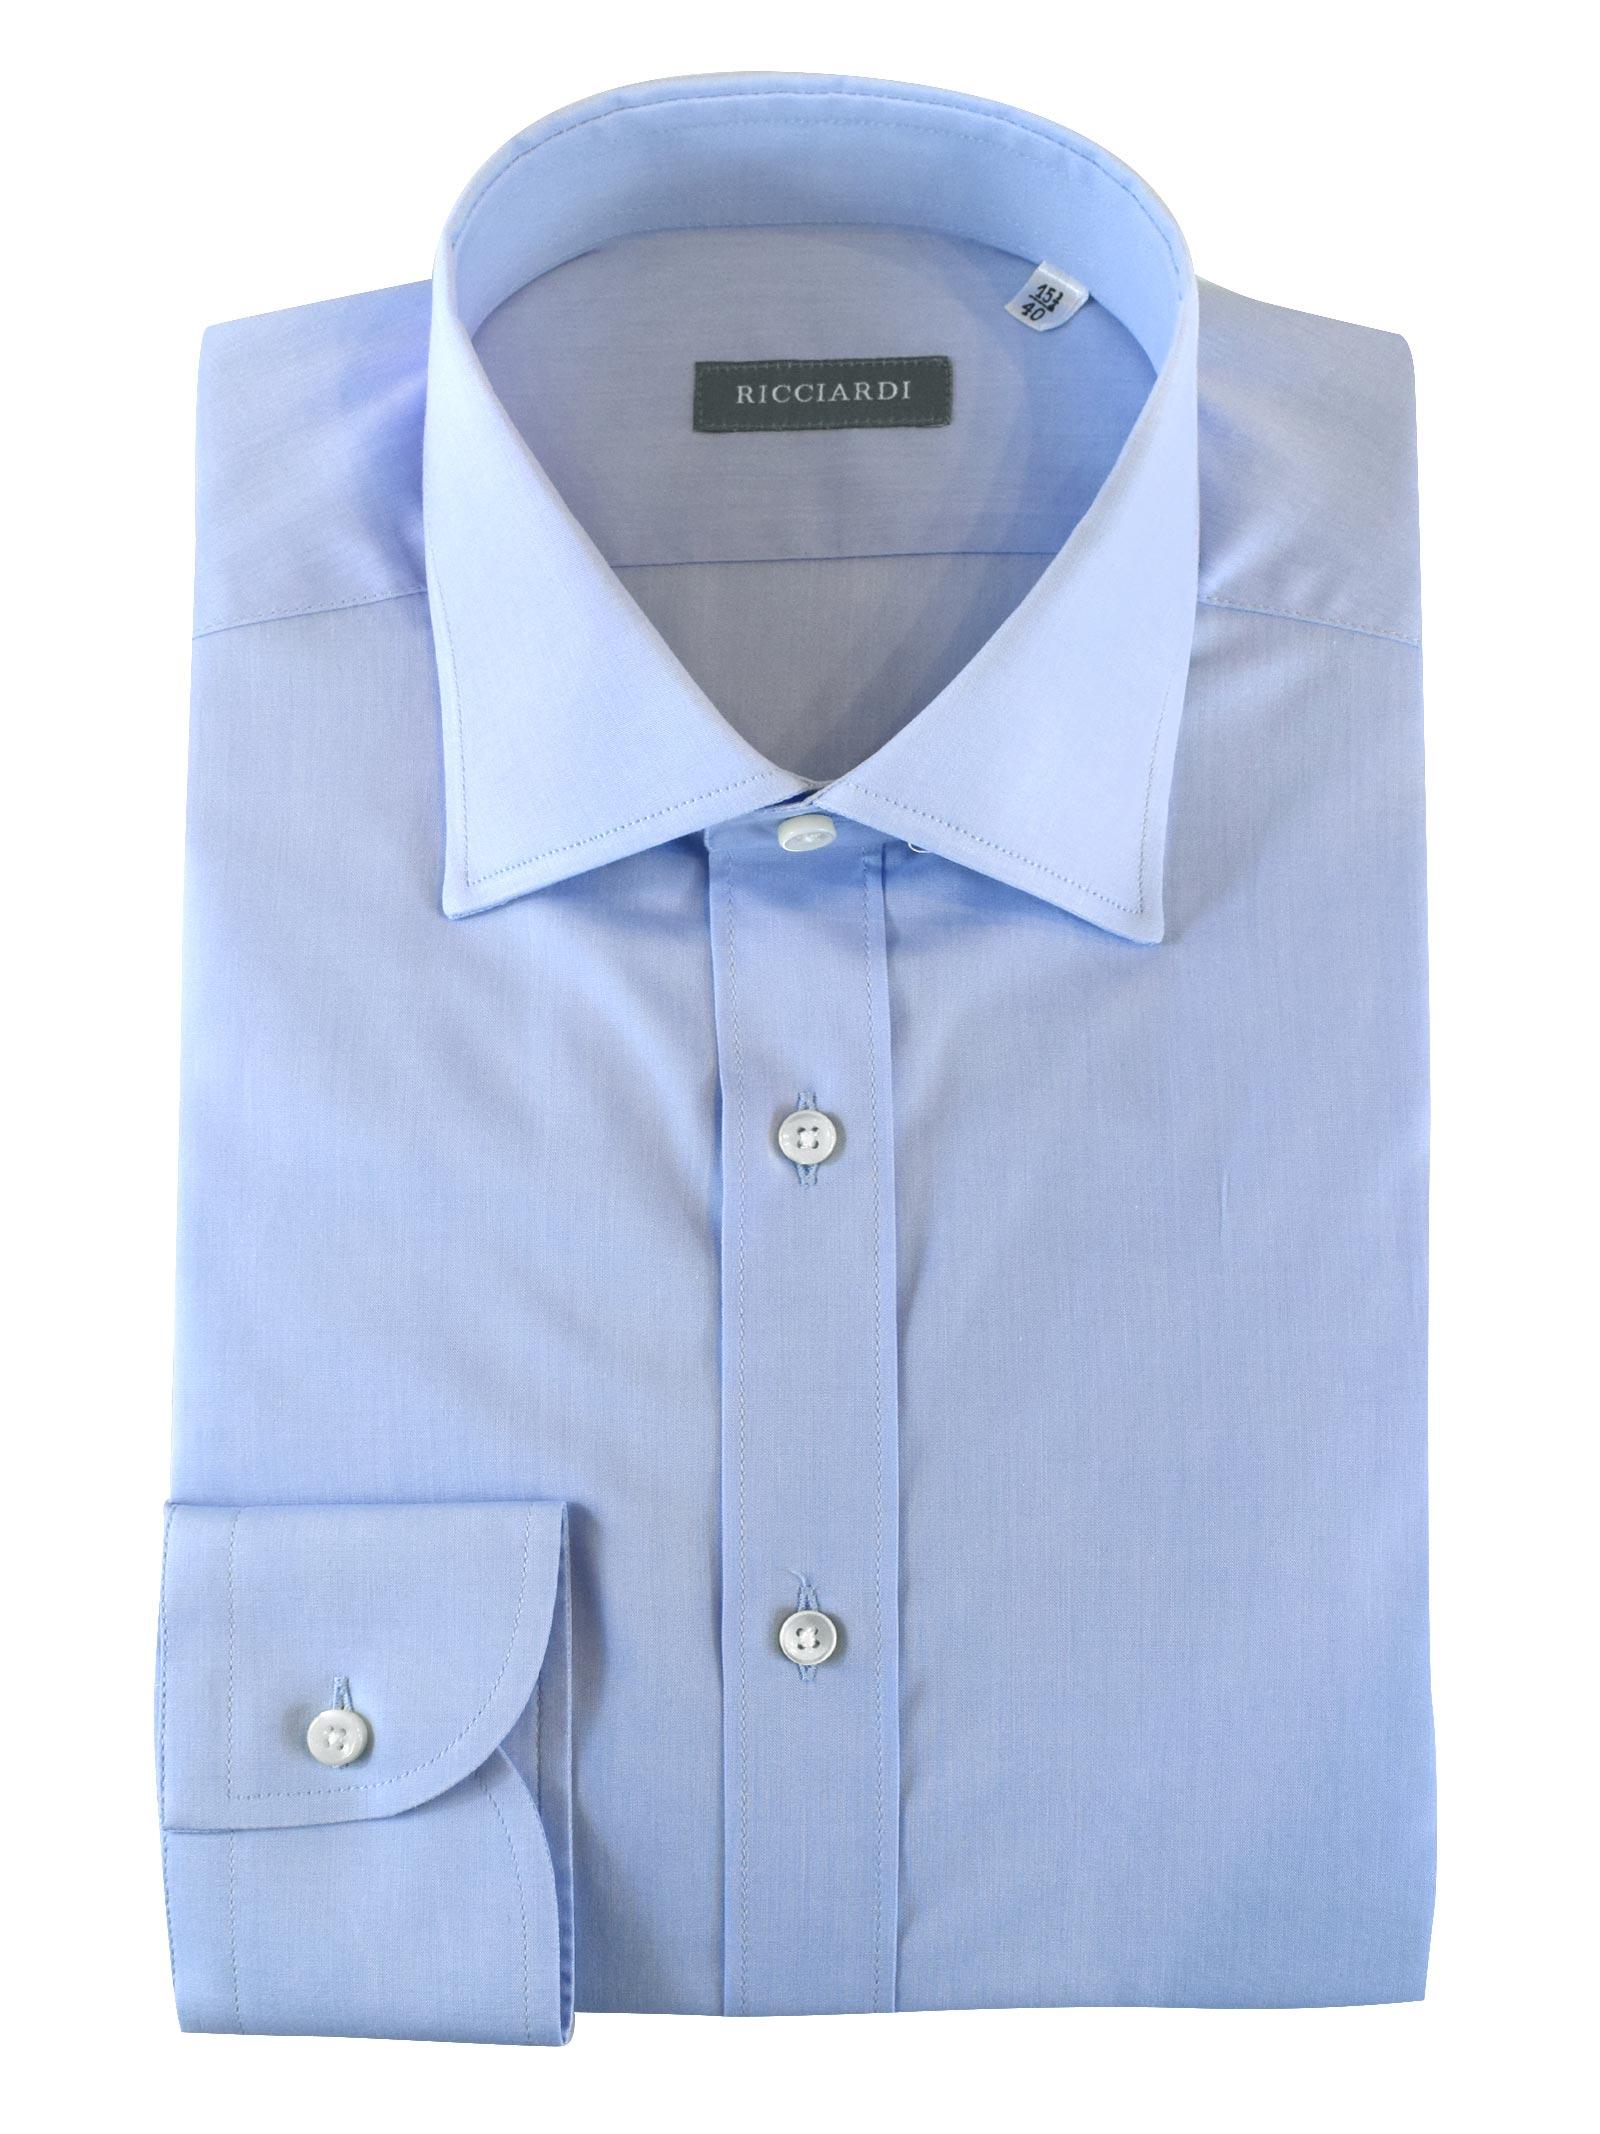 RICCIARDI | Shirts | ADONE2115